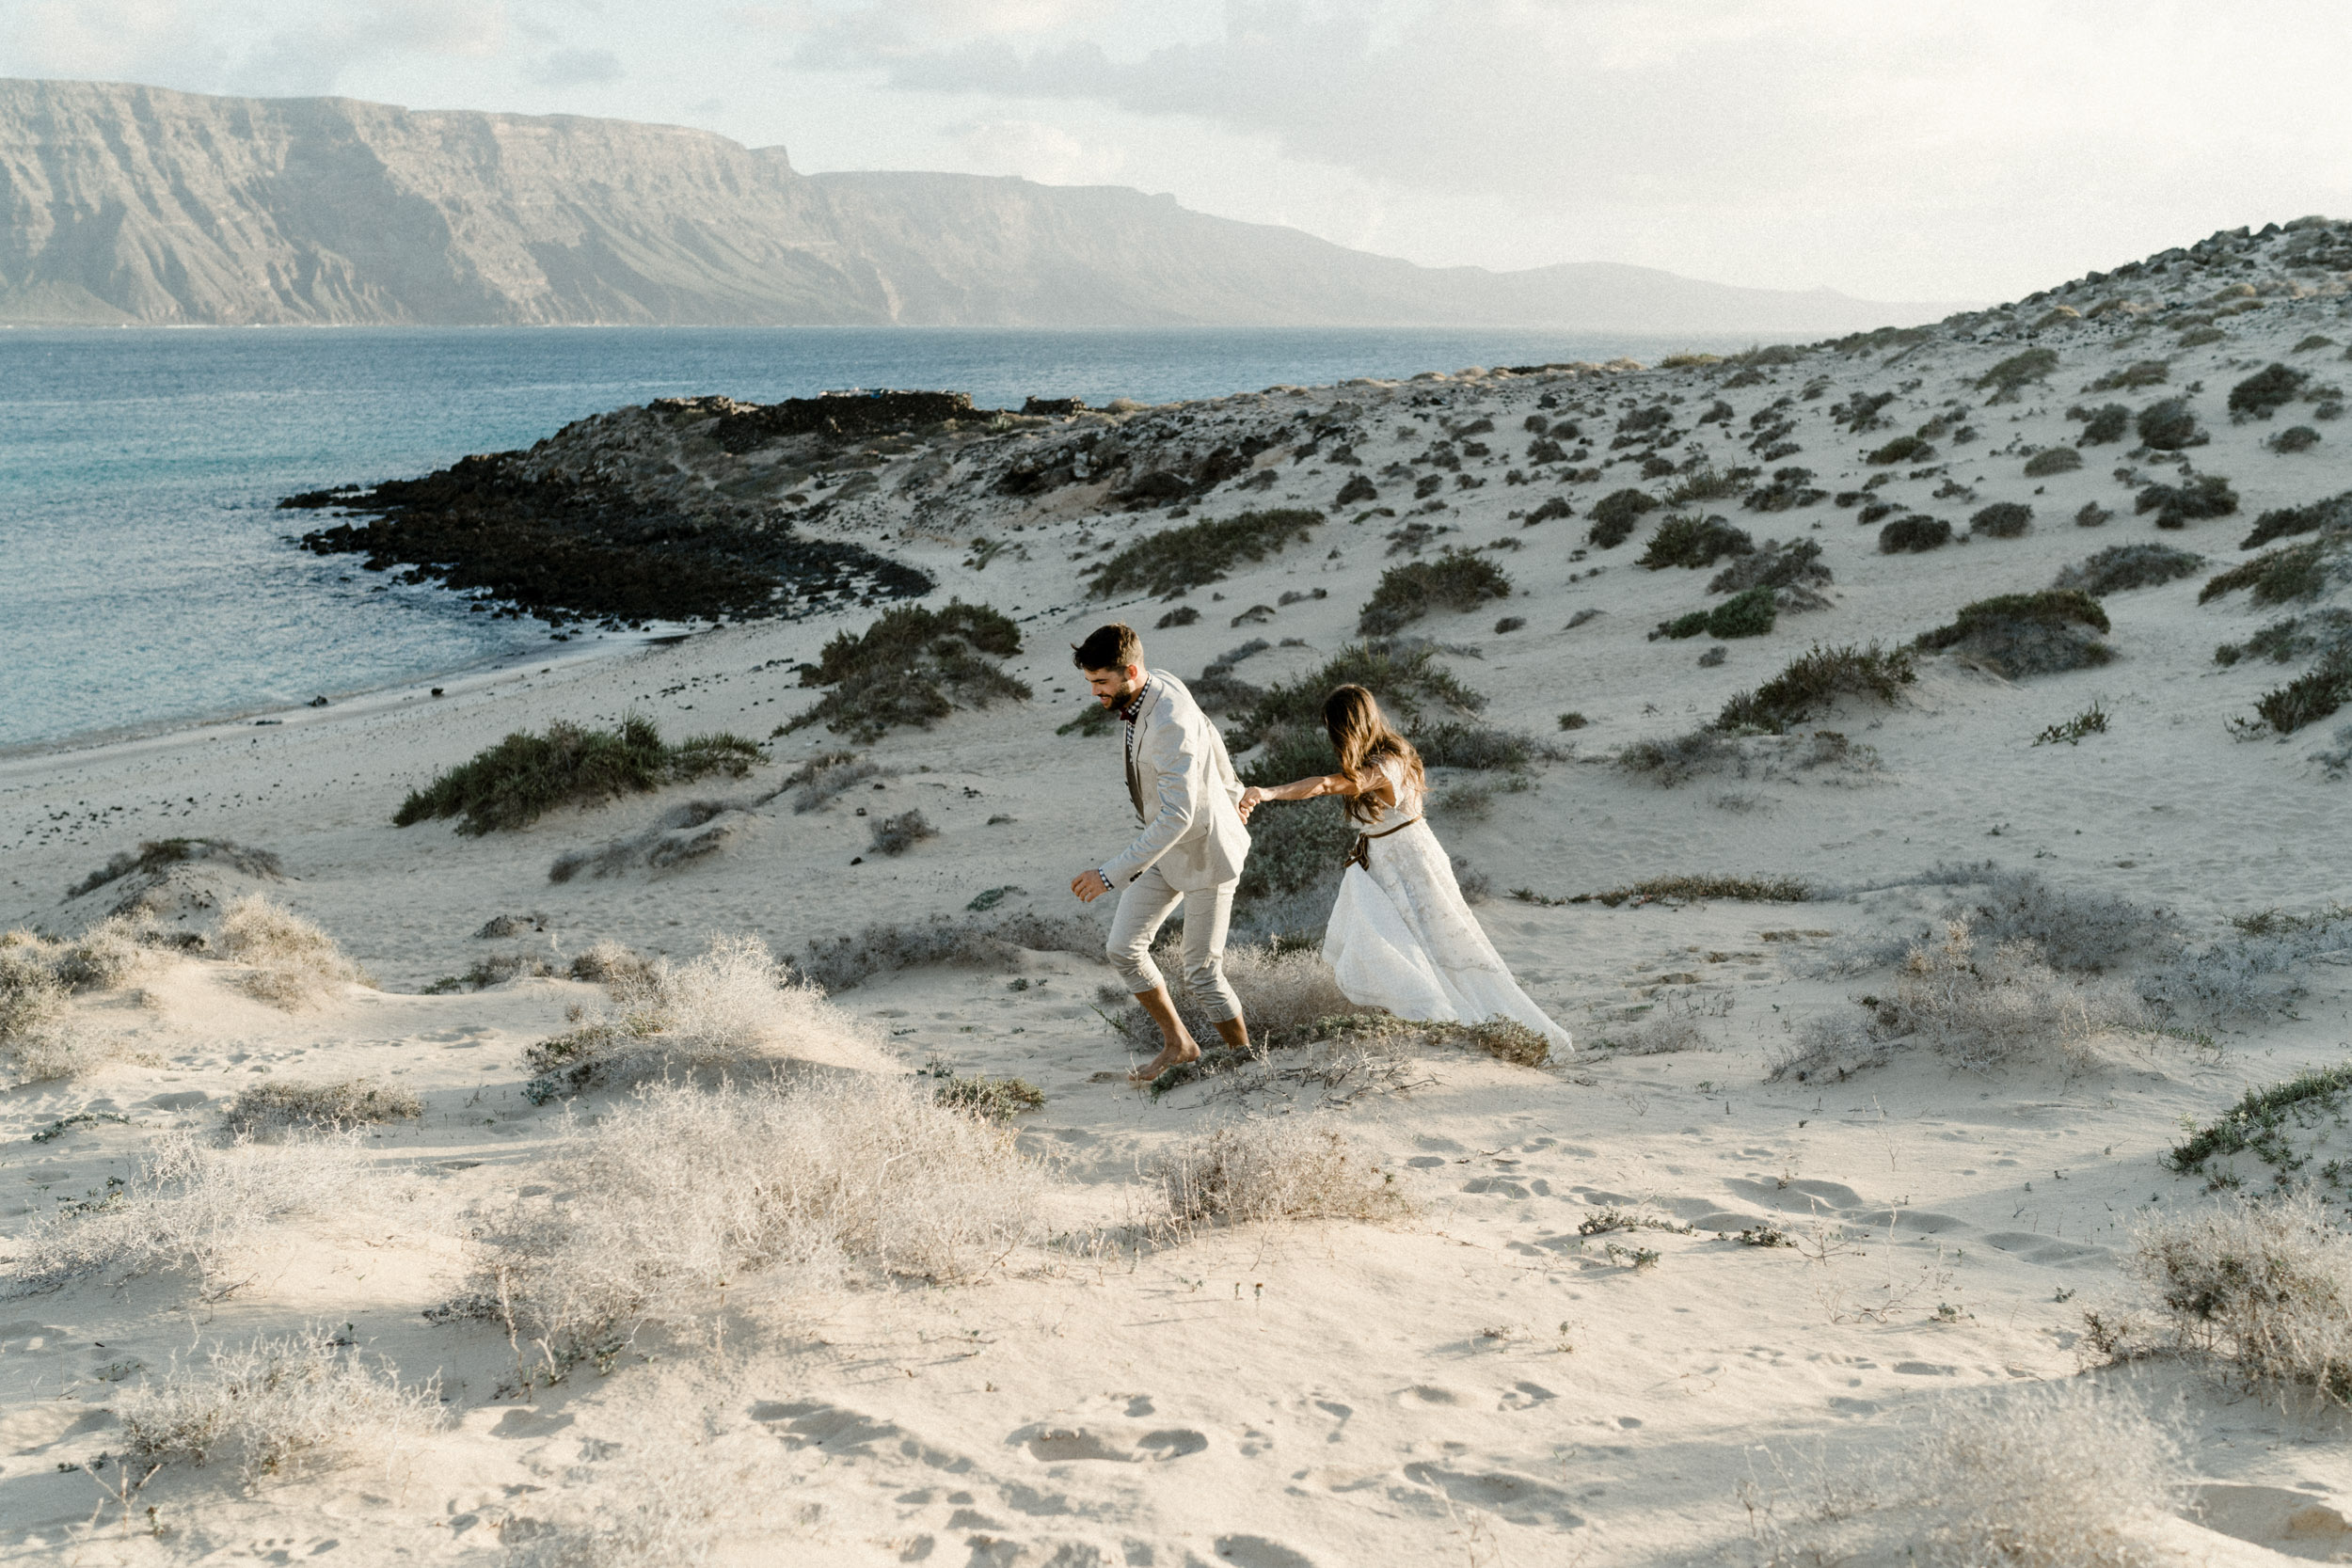 wedding_photographer_vienna_sky_and_arrows-18.jpg